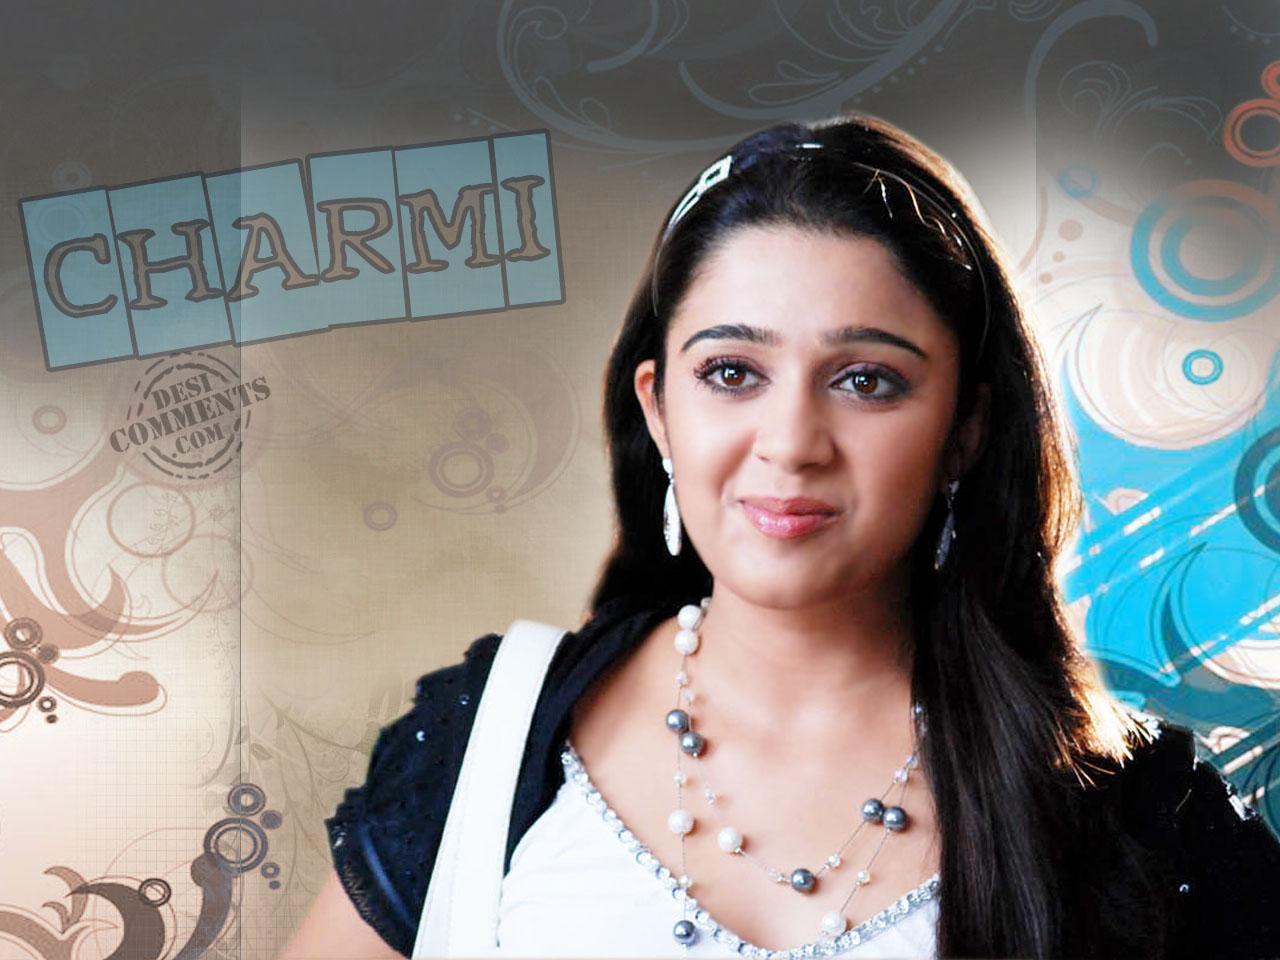 Telugu Actress Charmi Hot New Pictures Hot Charmi Kaur Wallpapers amp